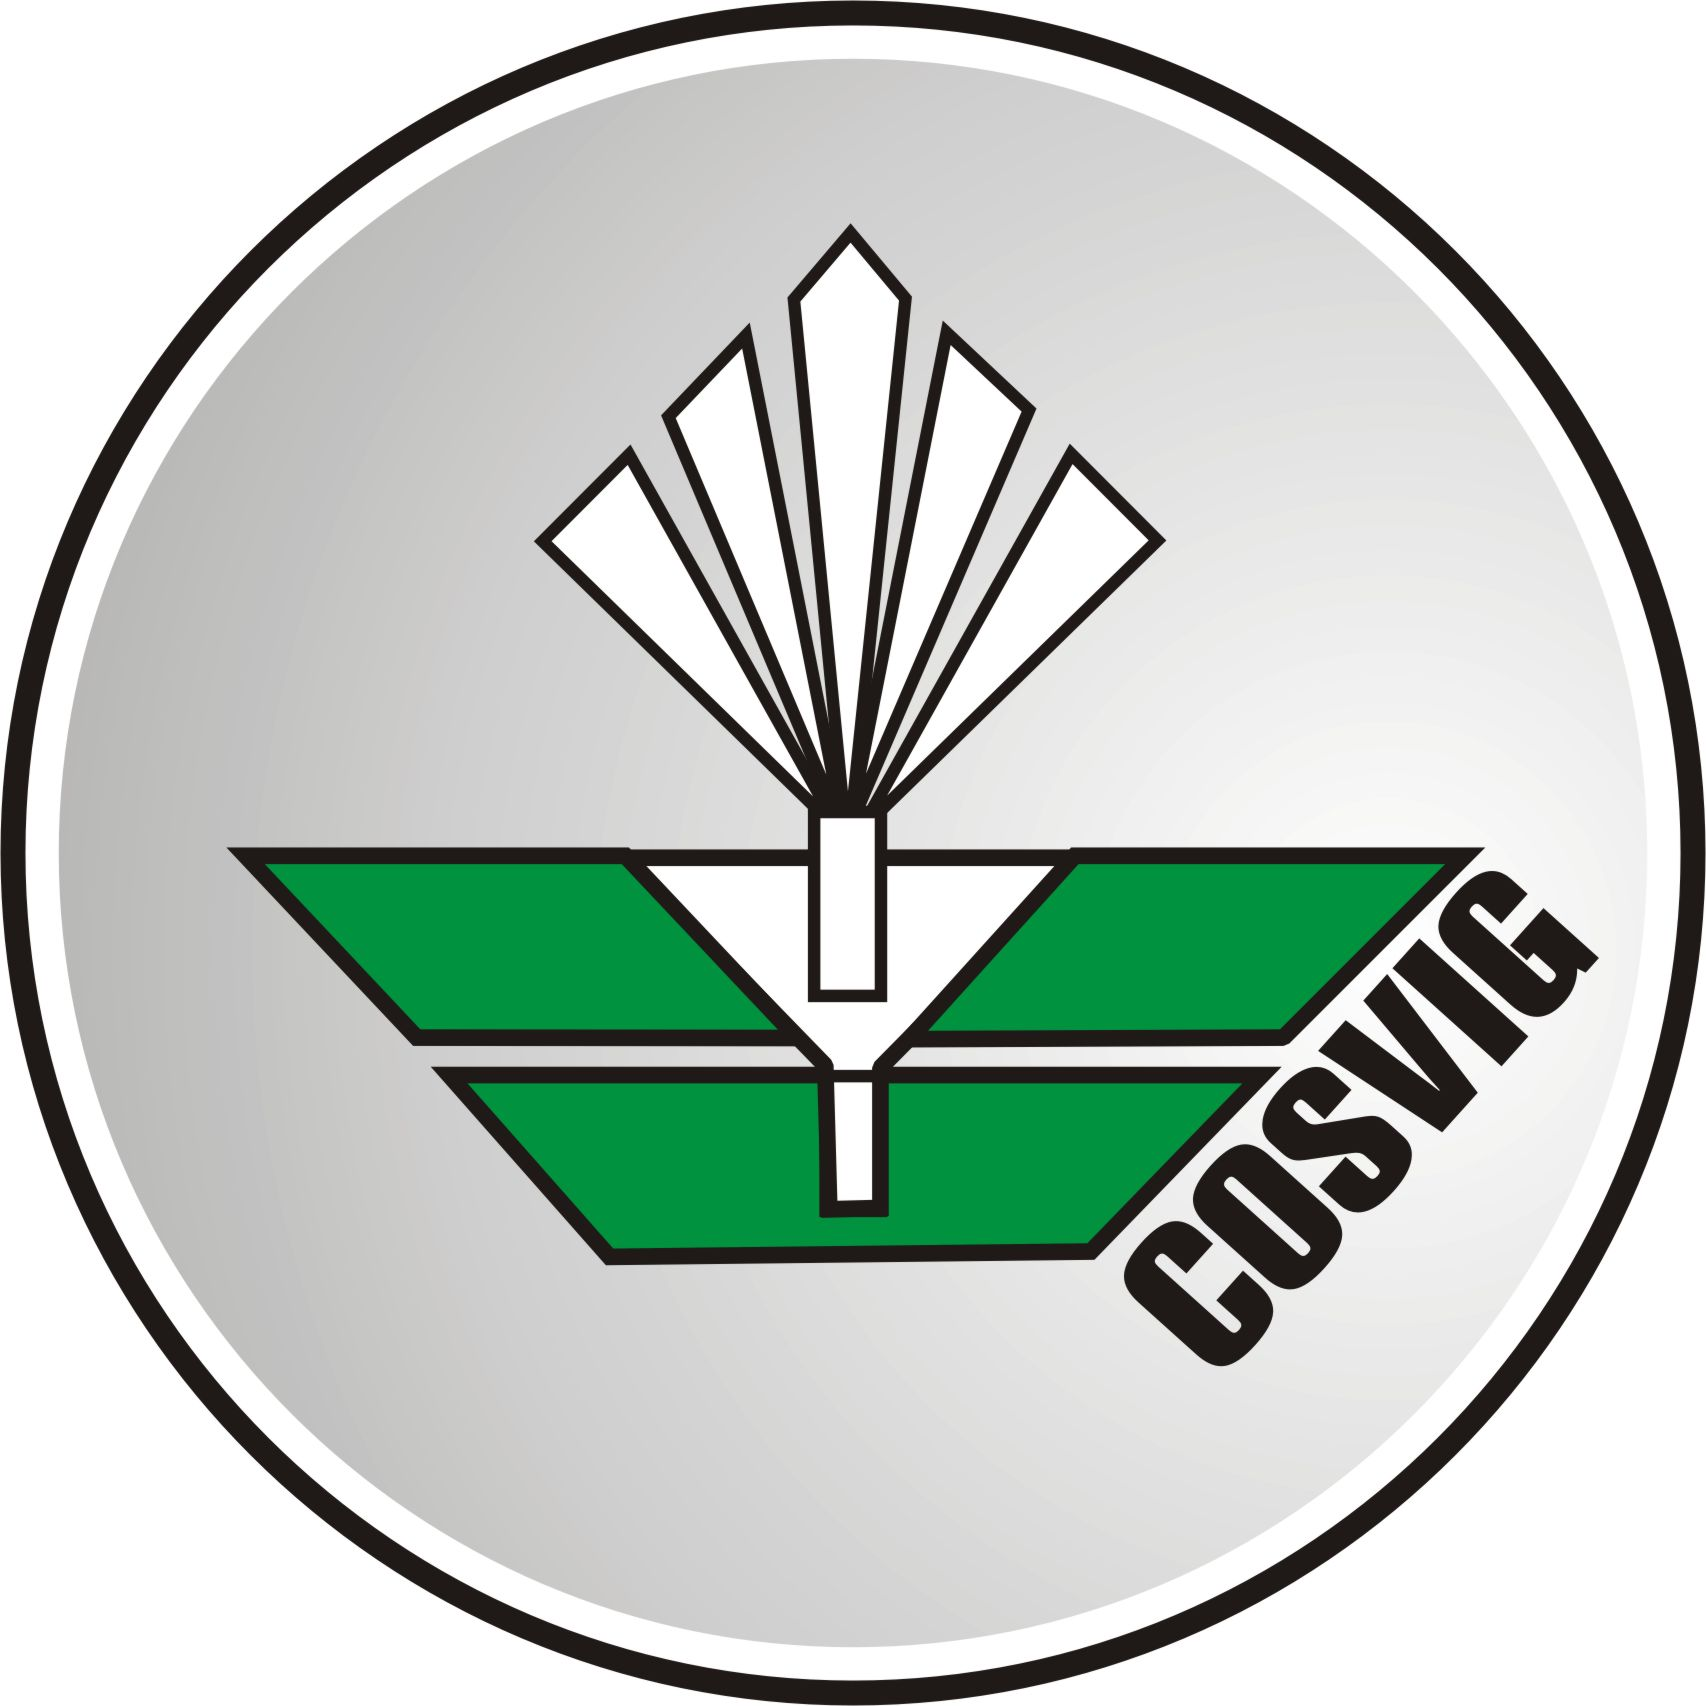 cosviglogo2012.jpg